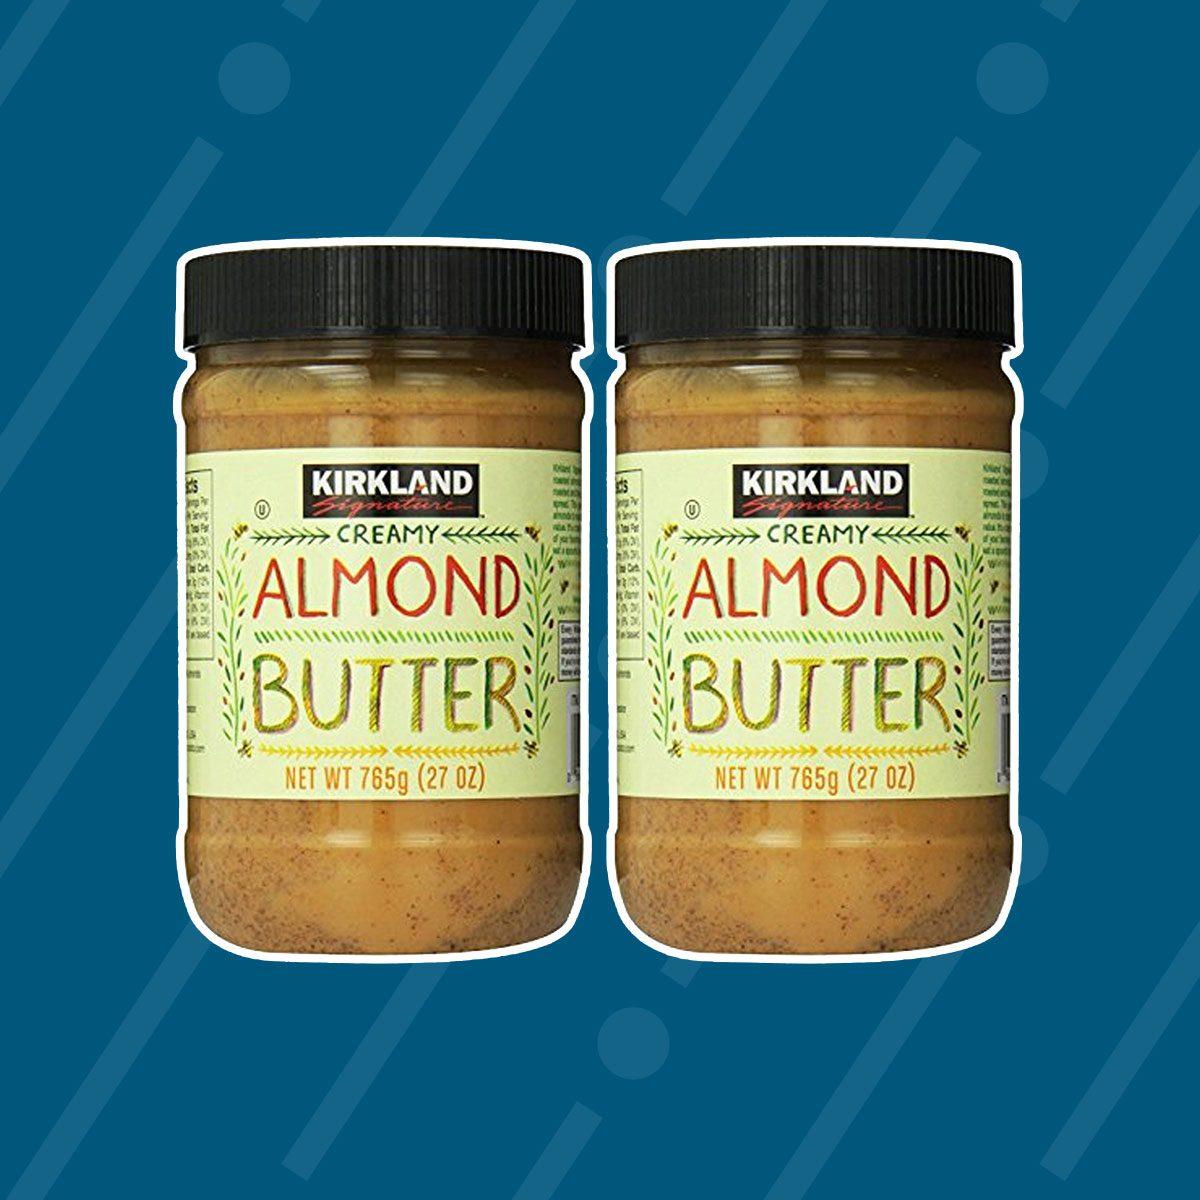 Costco: Kirkland Creamy Almond Butter